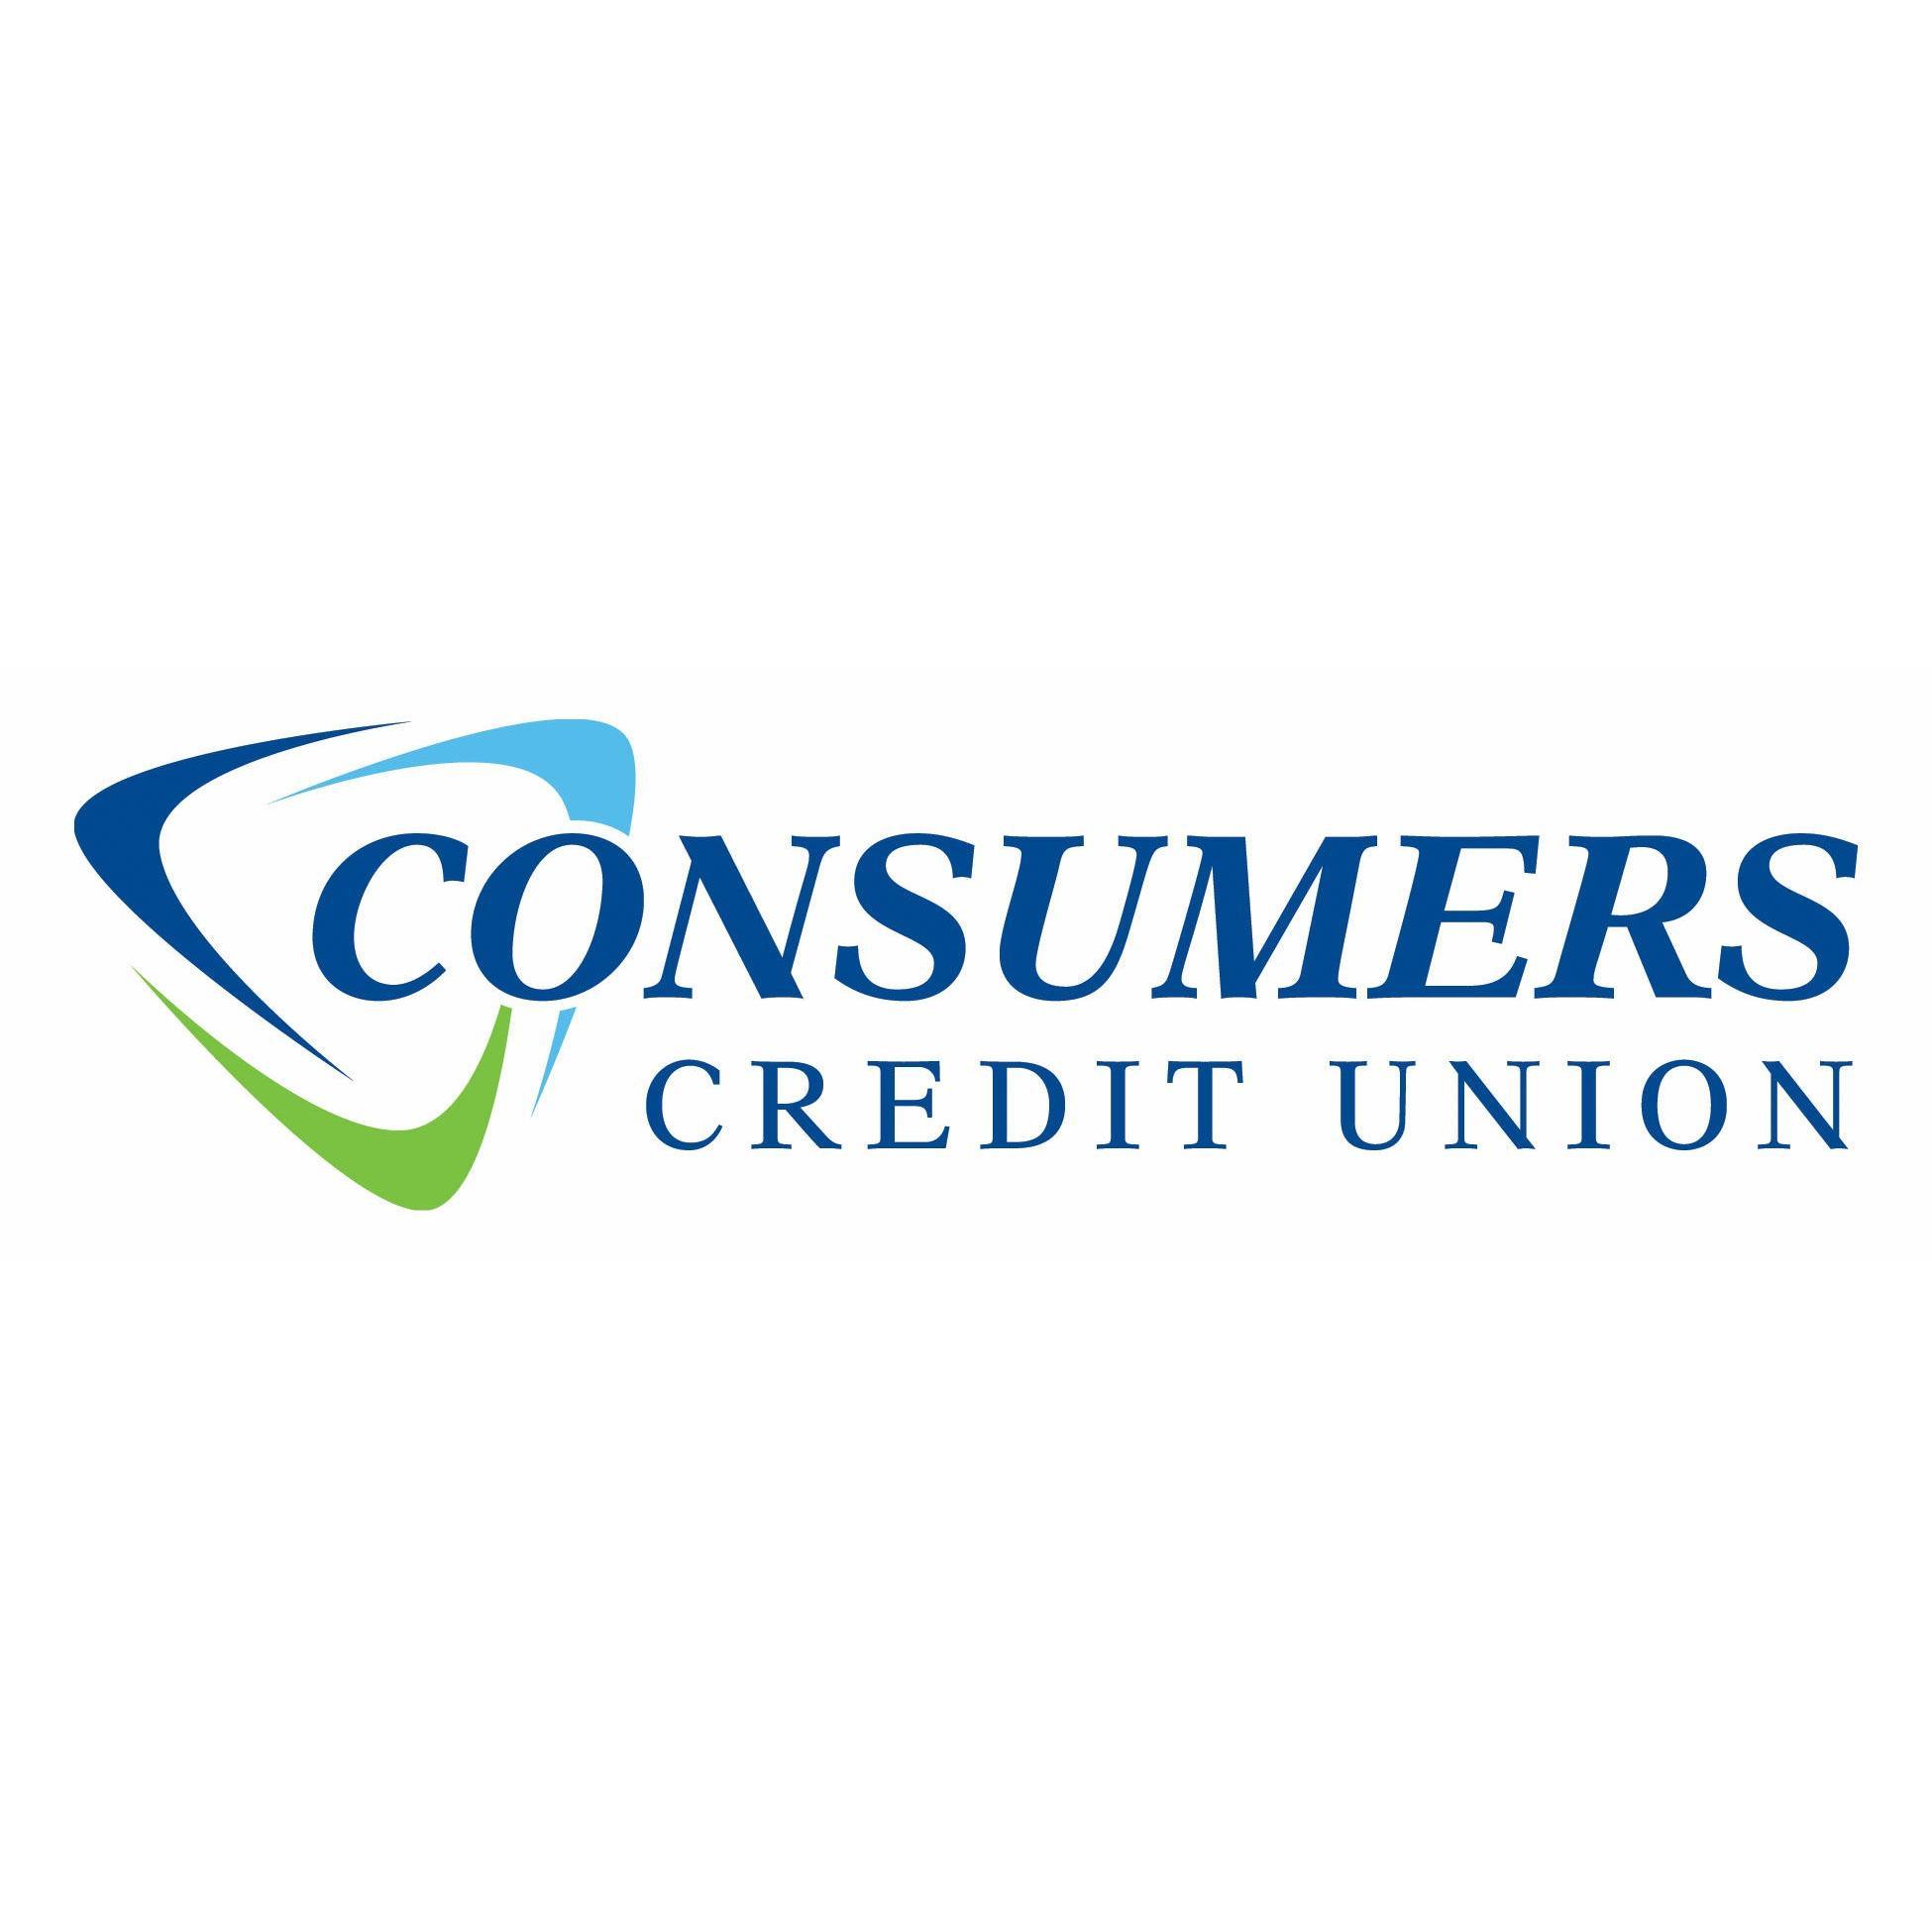 Consumers Credit Union image 1